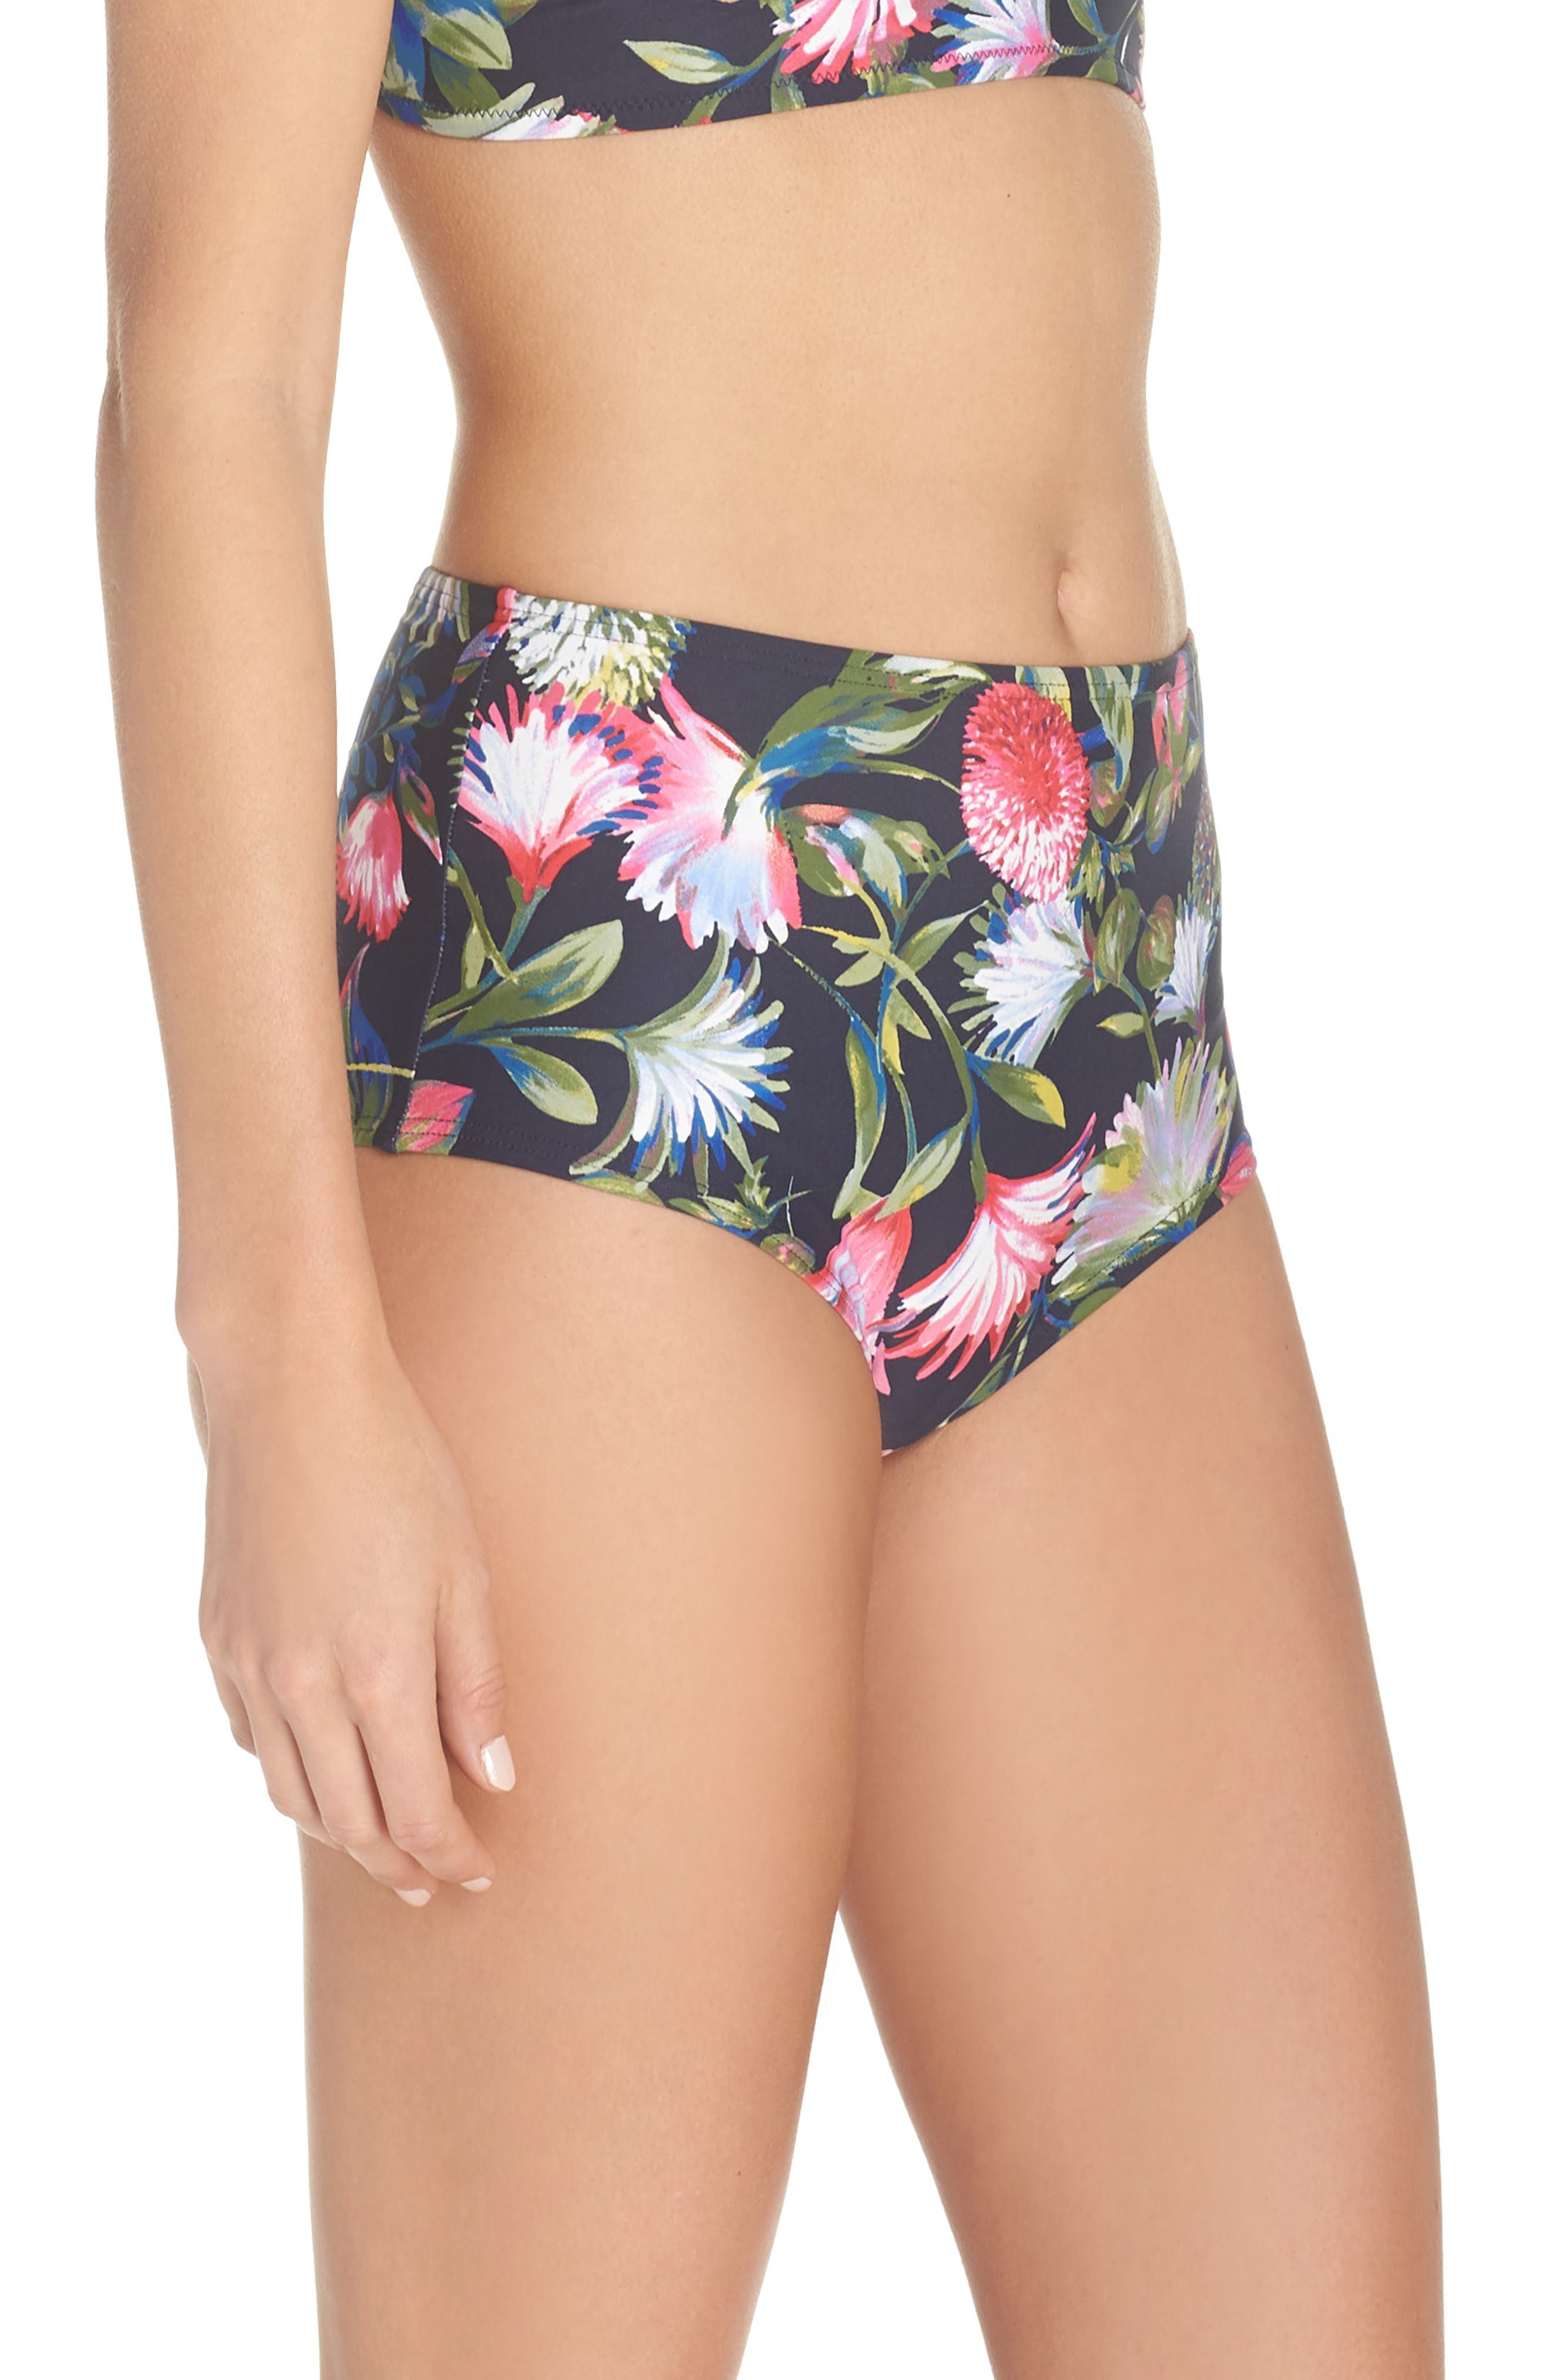 Floral Seamless High Waist Bikini Bottoms,                             Alternate thumbnail 3, color,                             NAVY